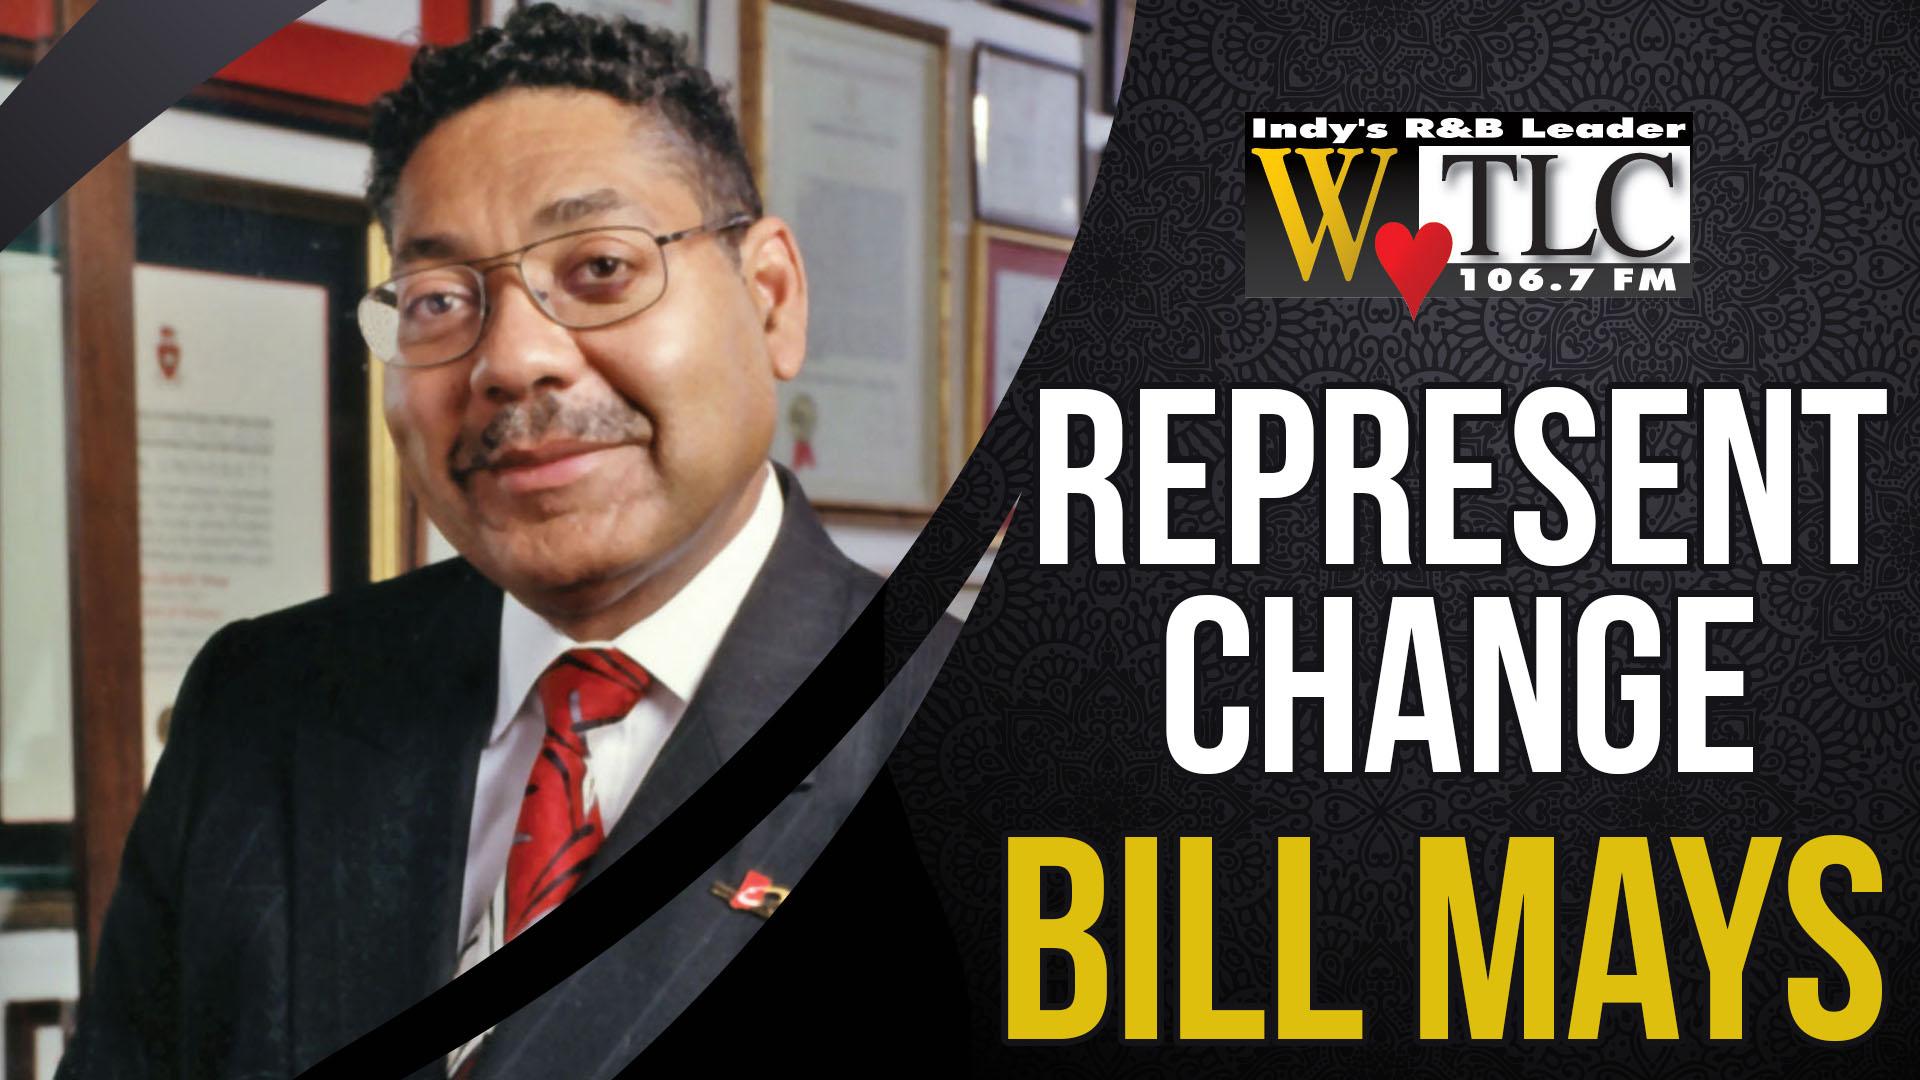 Represent Change: Bill Mays